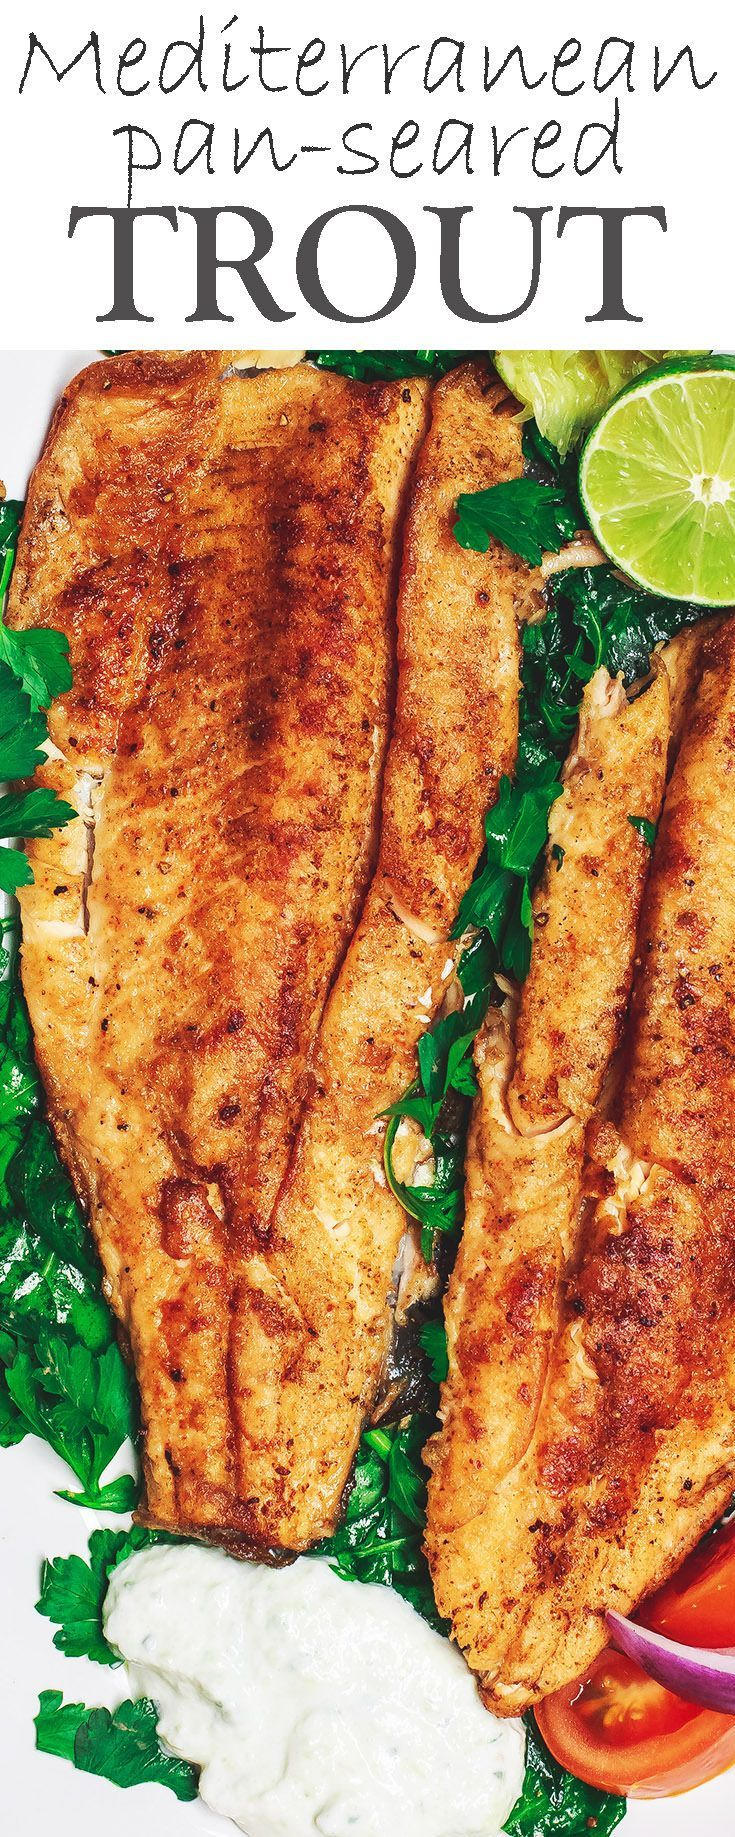 24 fish recipes trout ideas